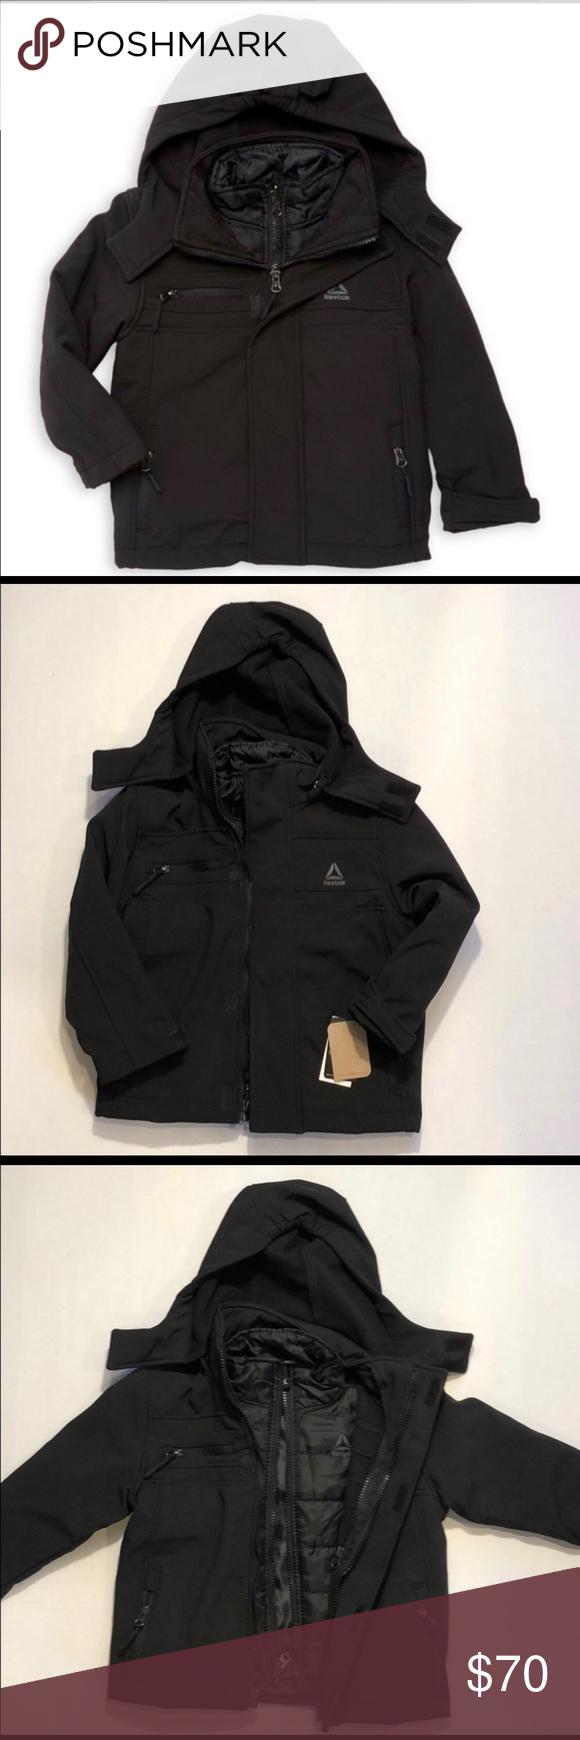 Reebok Boys Active Zipped Jacket With Hood 4t Hooded Jacket Jackets Zip Jackets [ 1740 x 580 Pixel ]